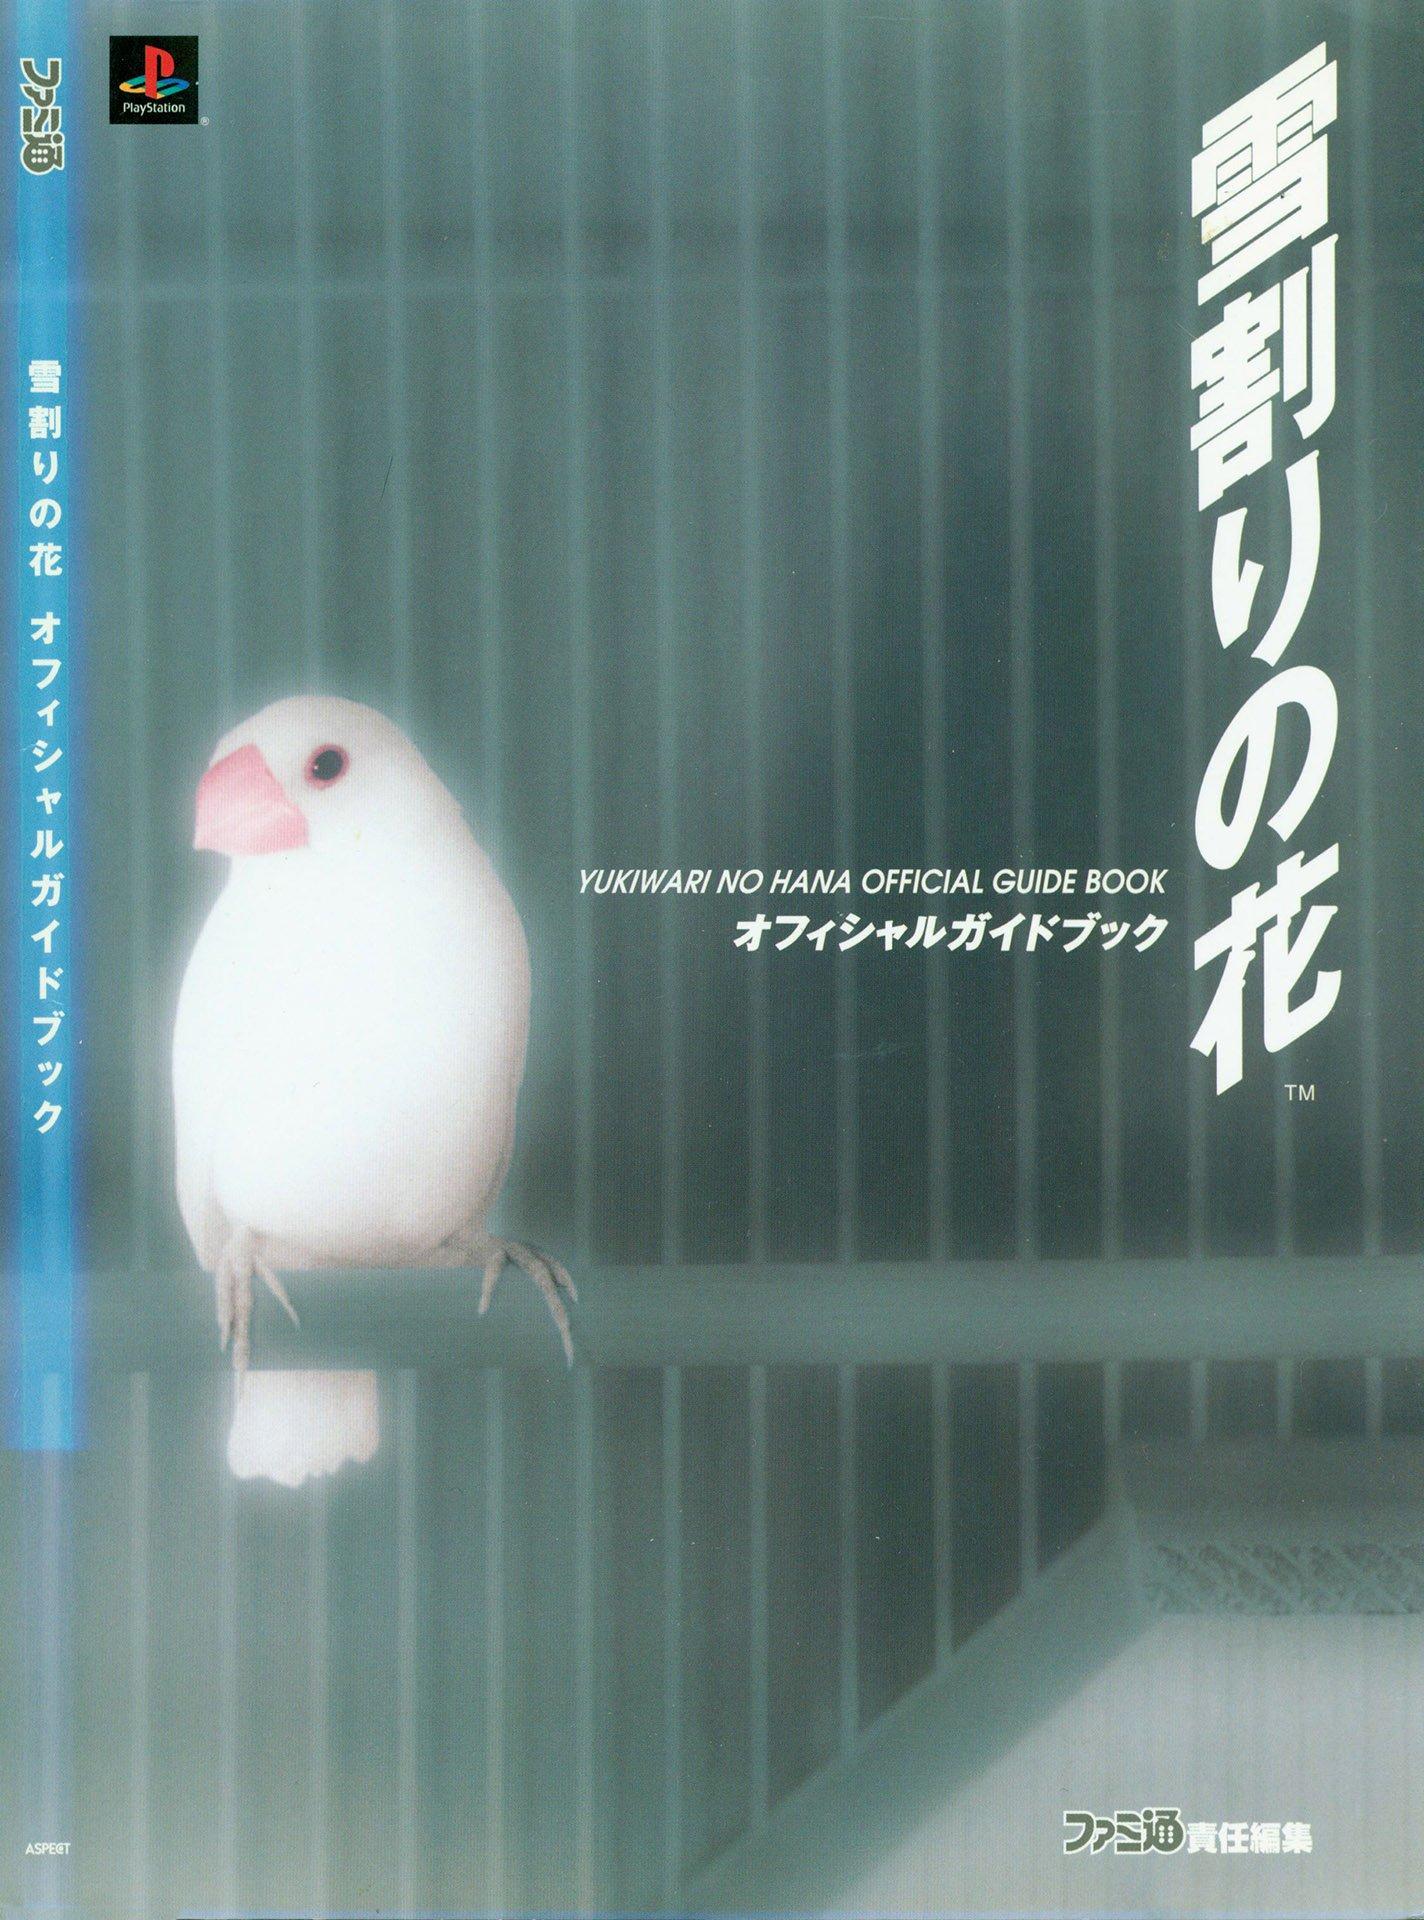 large.1616376111_YukiwarinoHana-OfficialGuideBook.jpg